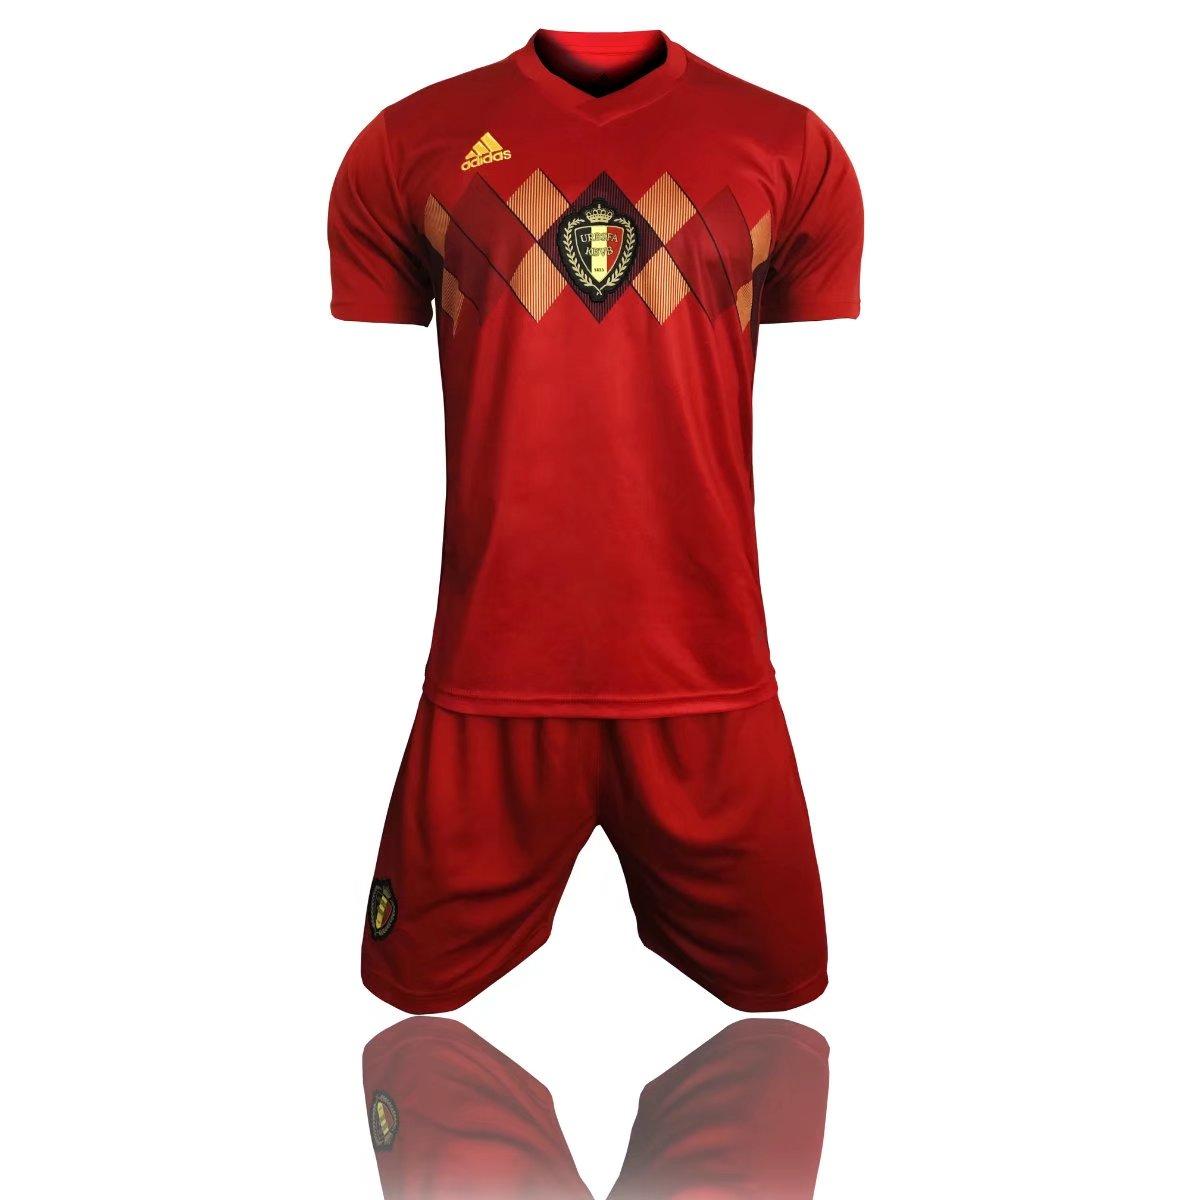 8d2d8f5f5 adidas russia world cup 2018 belgian national team best quality soccer  jerseys shirt item no 1